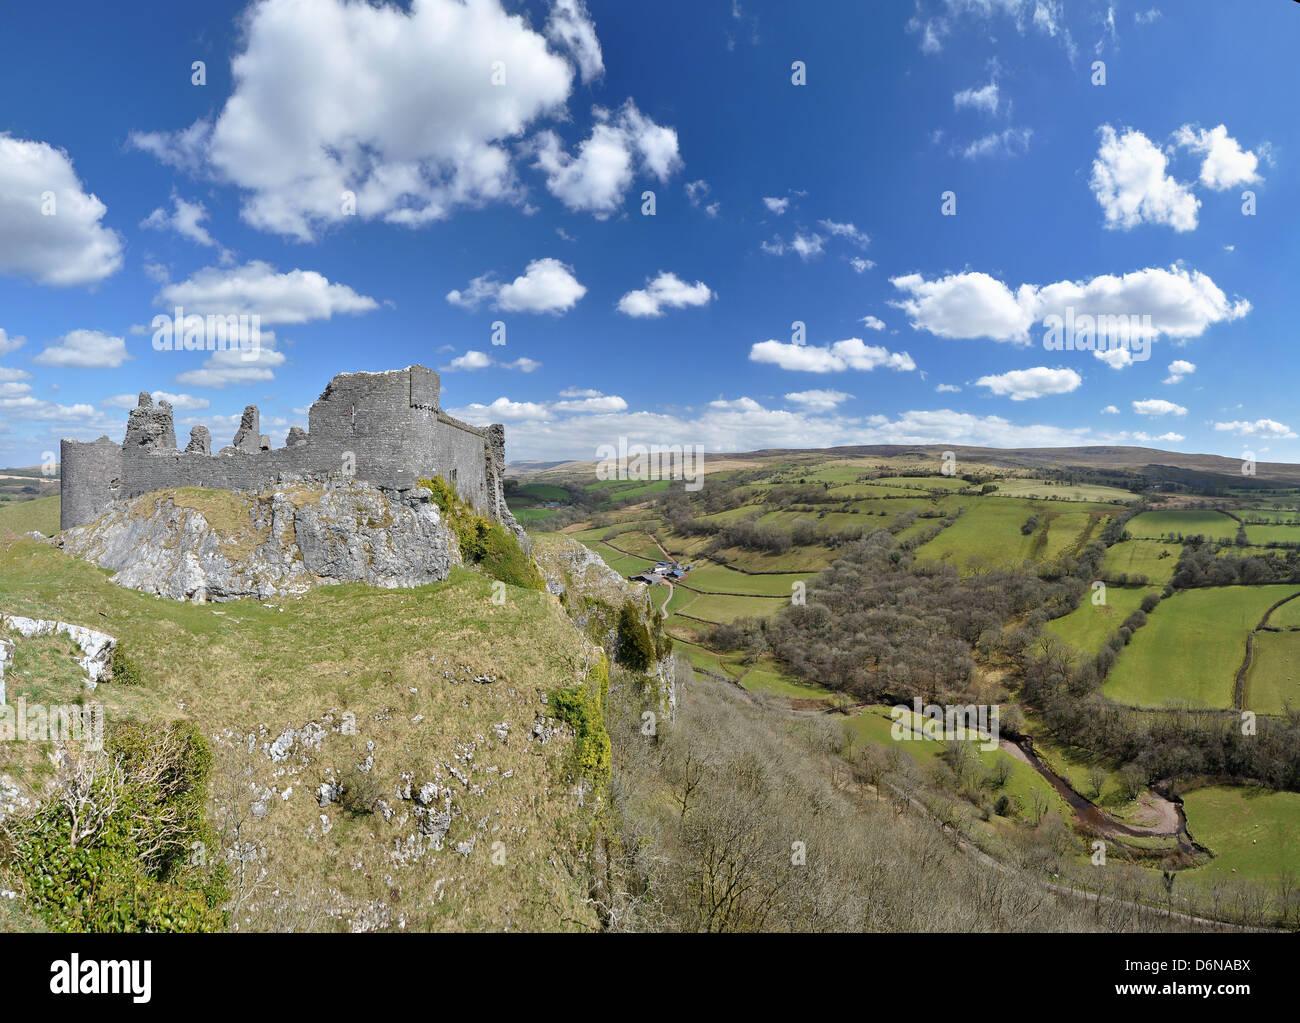 Carreg Cennen Castle Overlooks the lovely Brecon Beacons - Stock Image